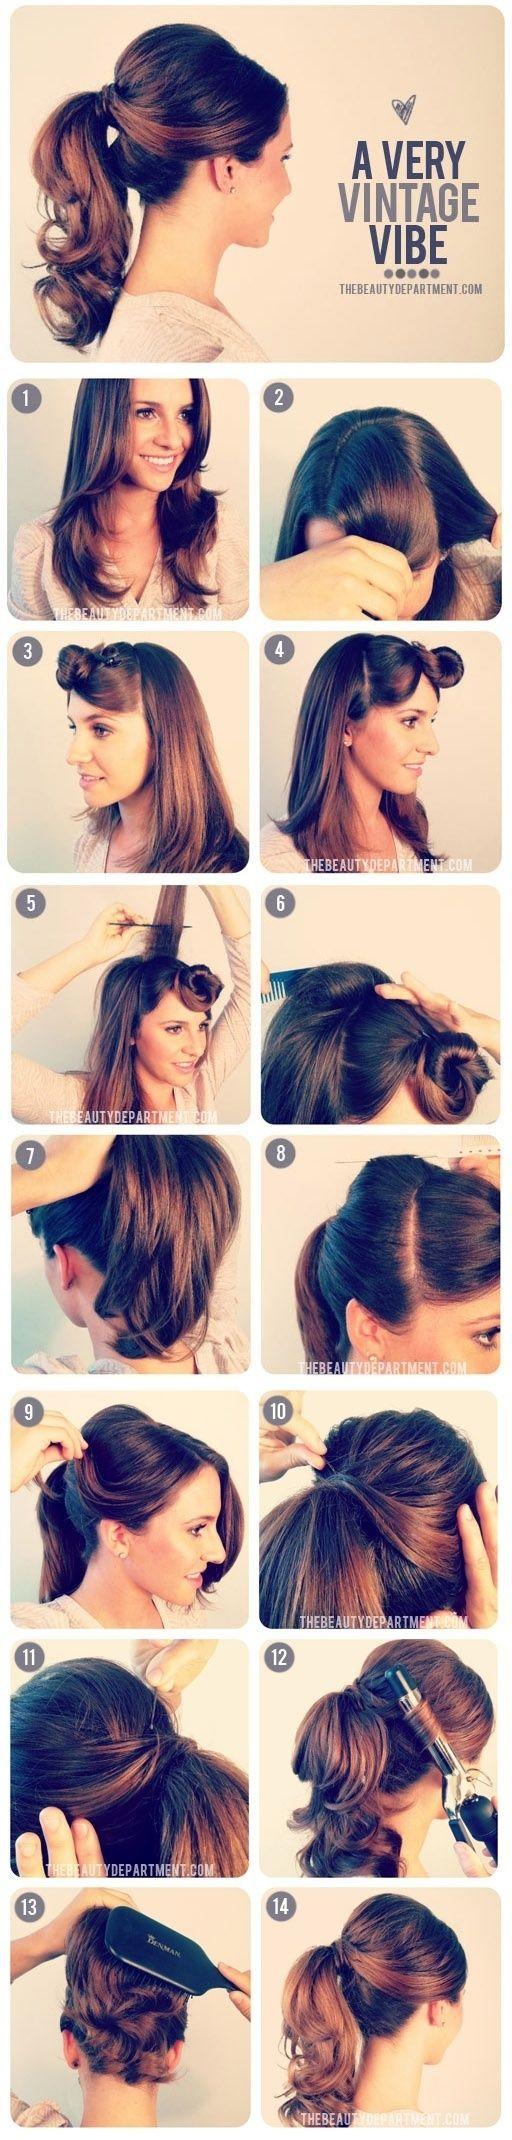 vintage ponytail tutorial                                                                                                                                                                                 More